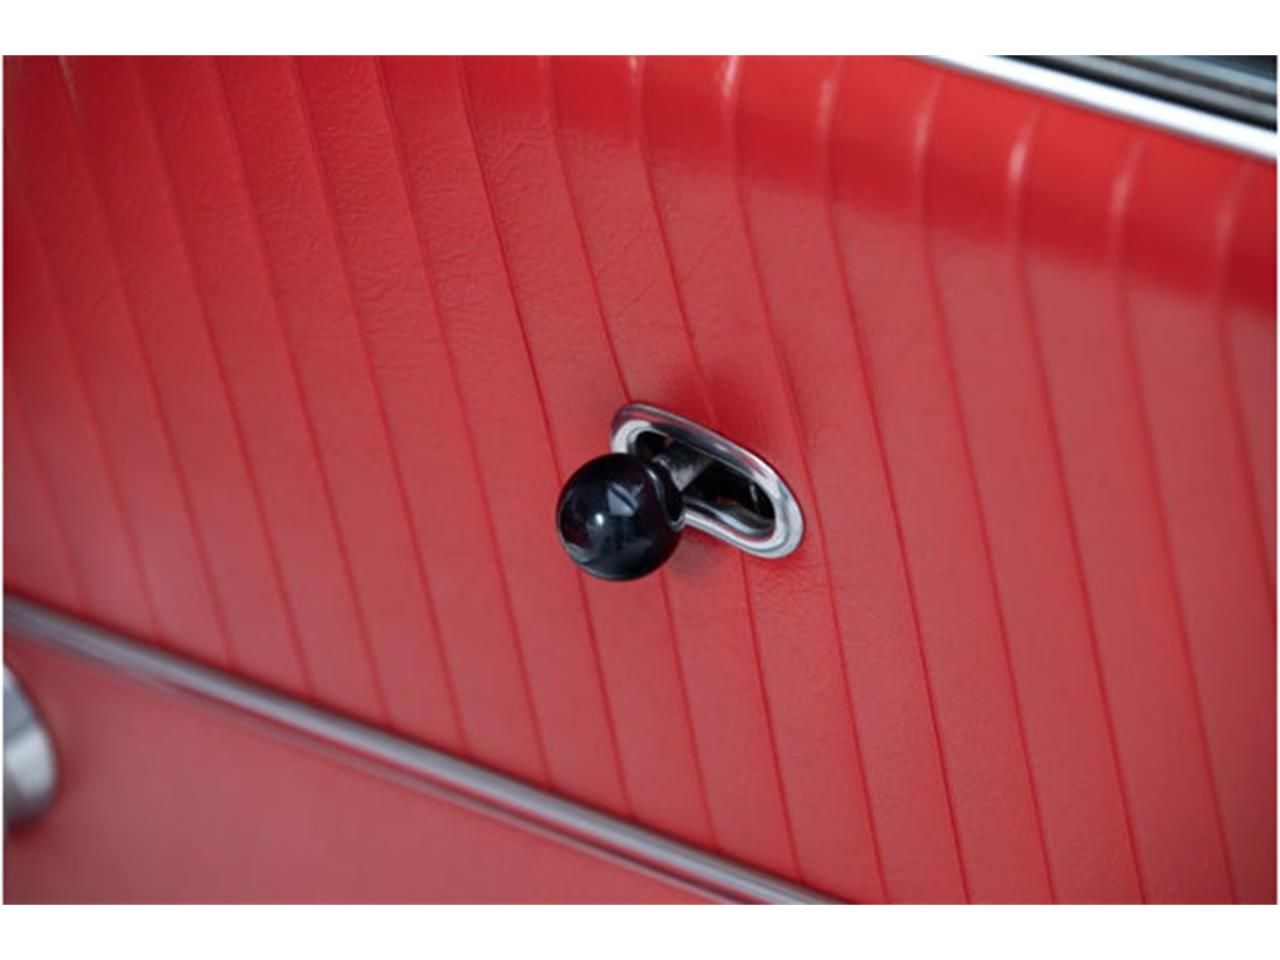 Large Picture of Classic 1963 Corvette located in New York - $139,999.00 - QOXV